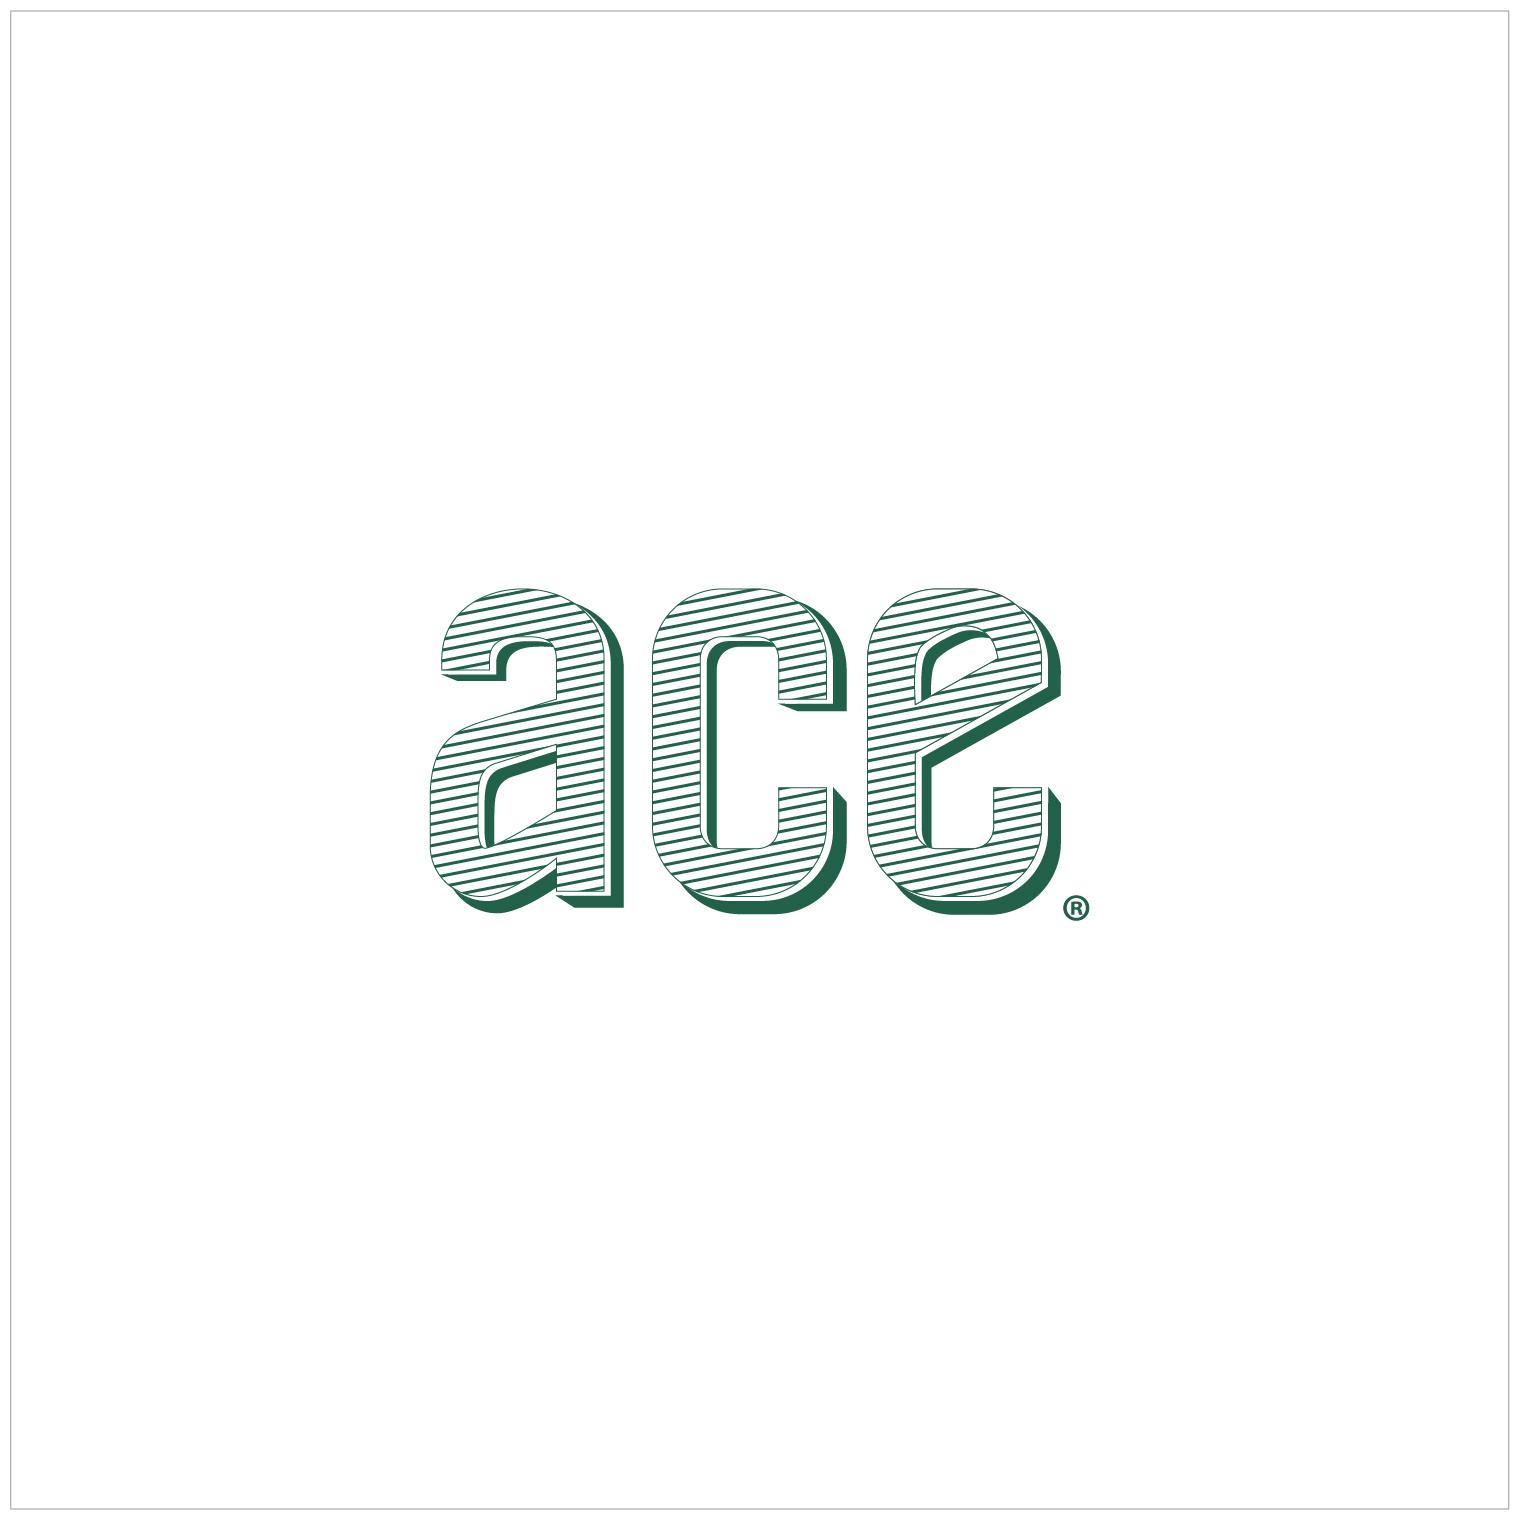 Ace-Color-WH1500px-greyOTL.jpg